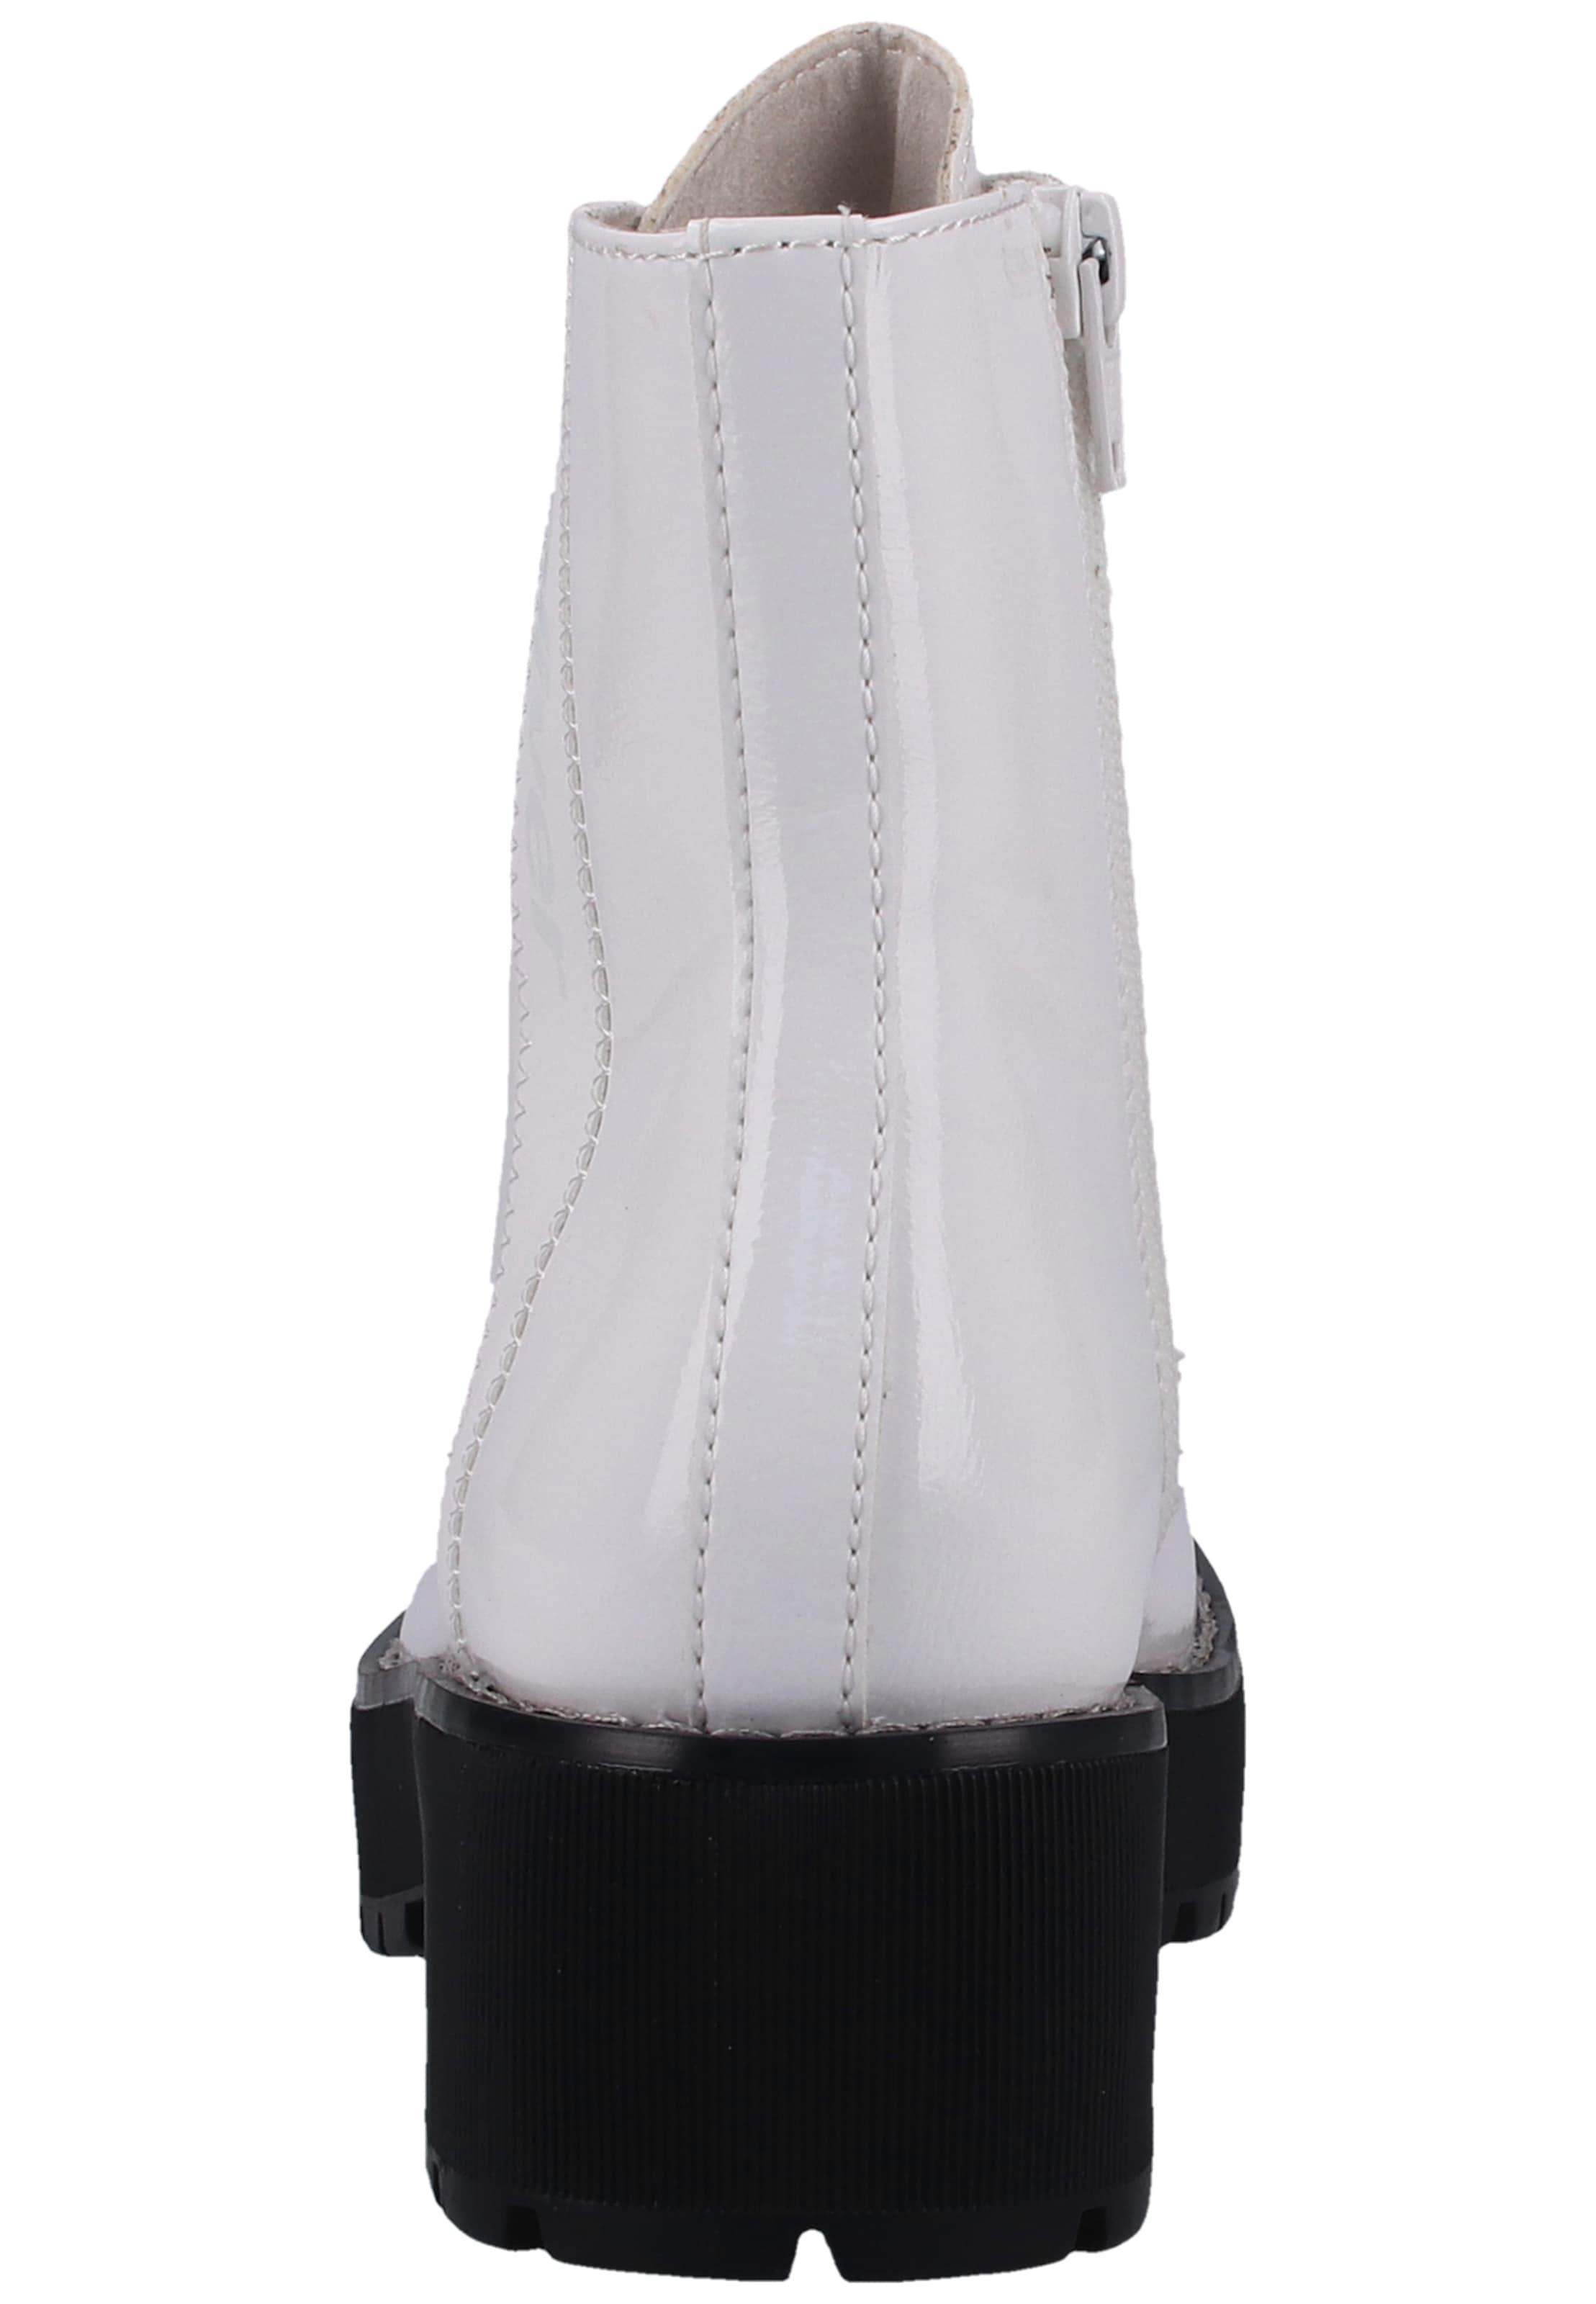 oliver S Blanc Bottines À Label Red En Lacets OZPXuik